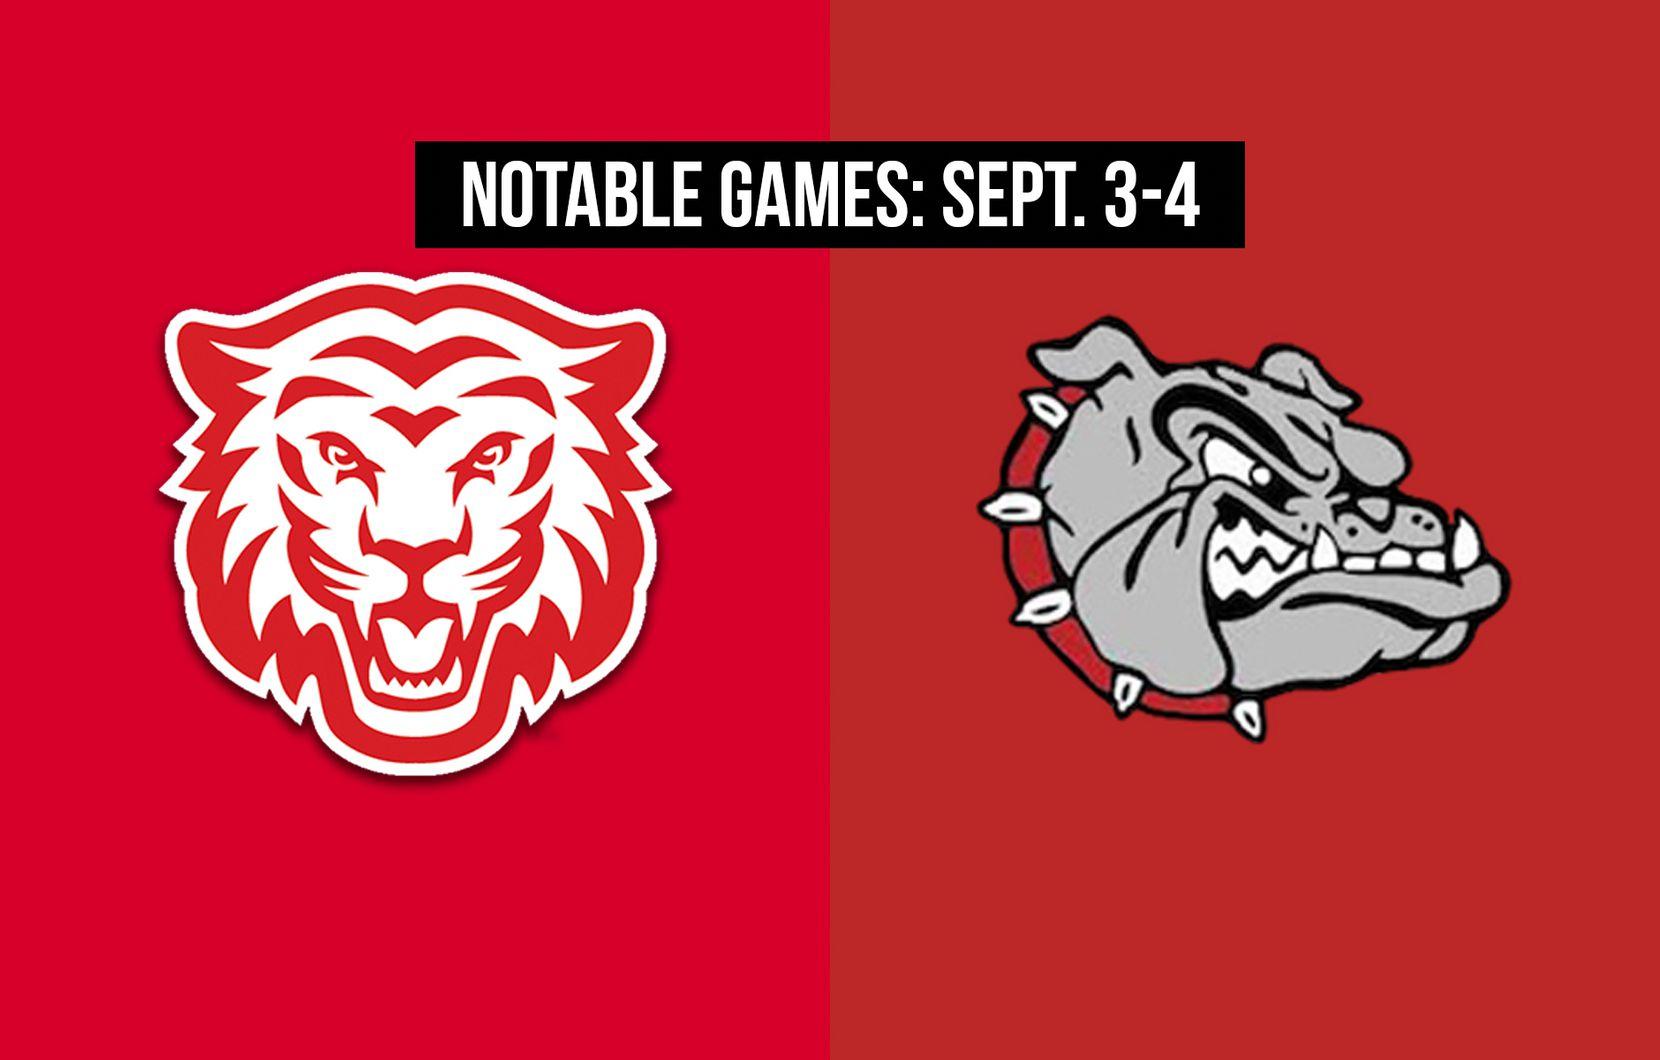 Notable games for the week of Sept. 3-4 of the 2020 season: Terrell vs. Kilgore.